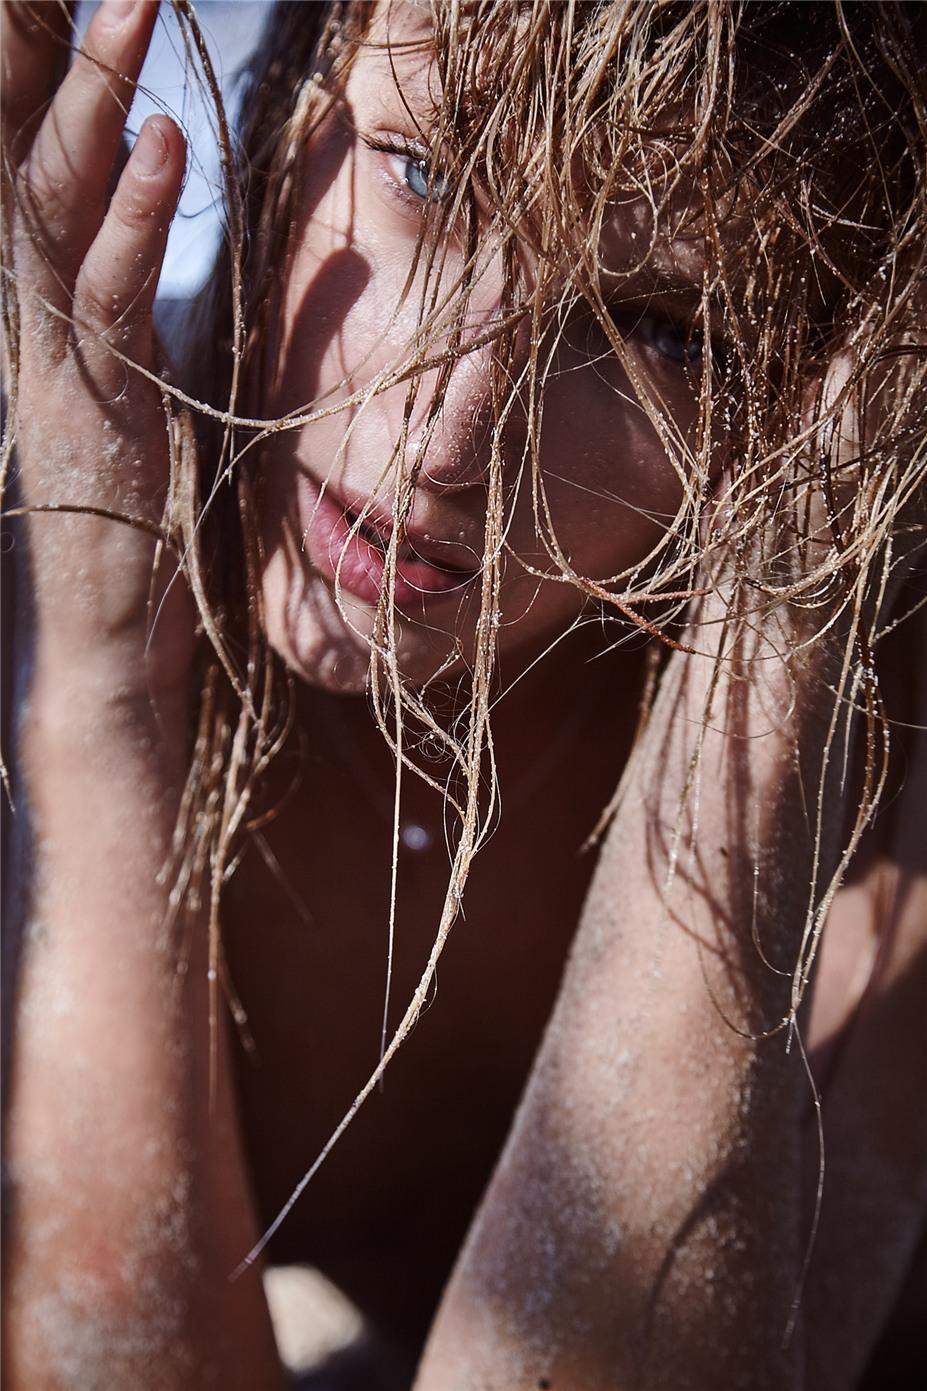 Елена Розенкова - Обнаженные девушки на пляжах Ибицы / Ibiza Nudes by Diane Betties